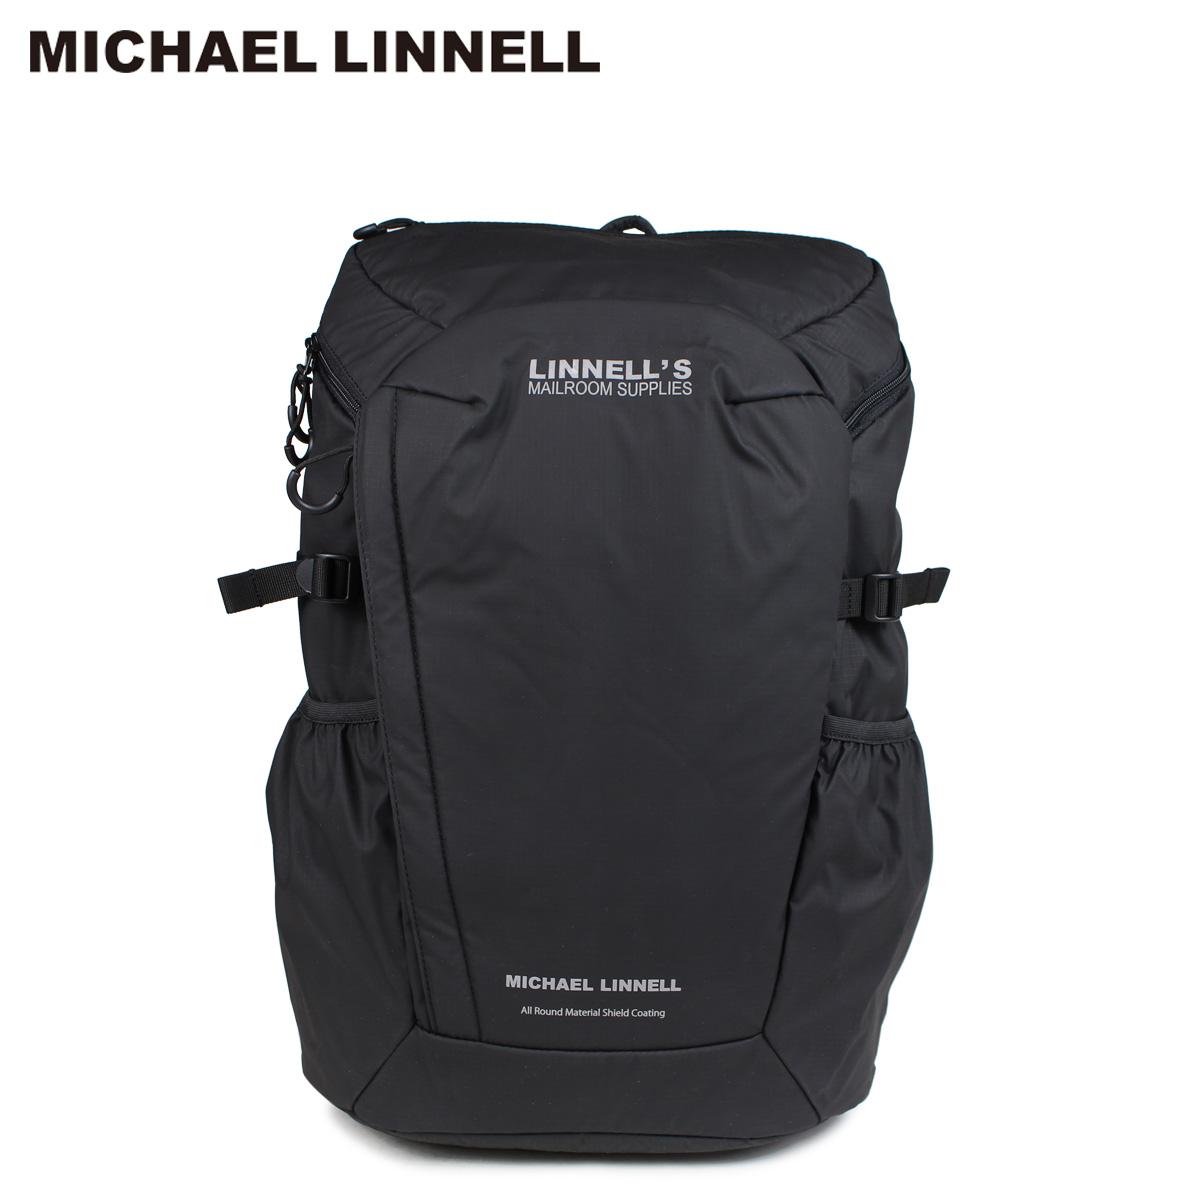 MICHAEL LINNELL マイケルリンネル リュック バッグ 29L メンズ レディース バックパック BACKPACK ブラック MLAC-01 [10/22 新入荷]